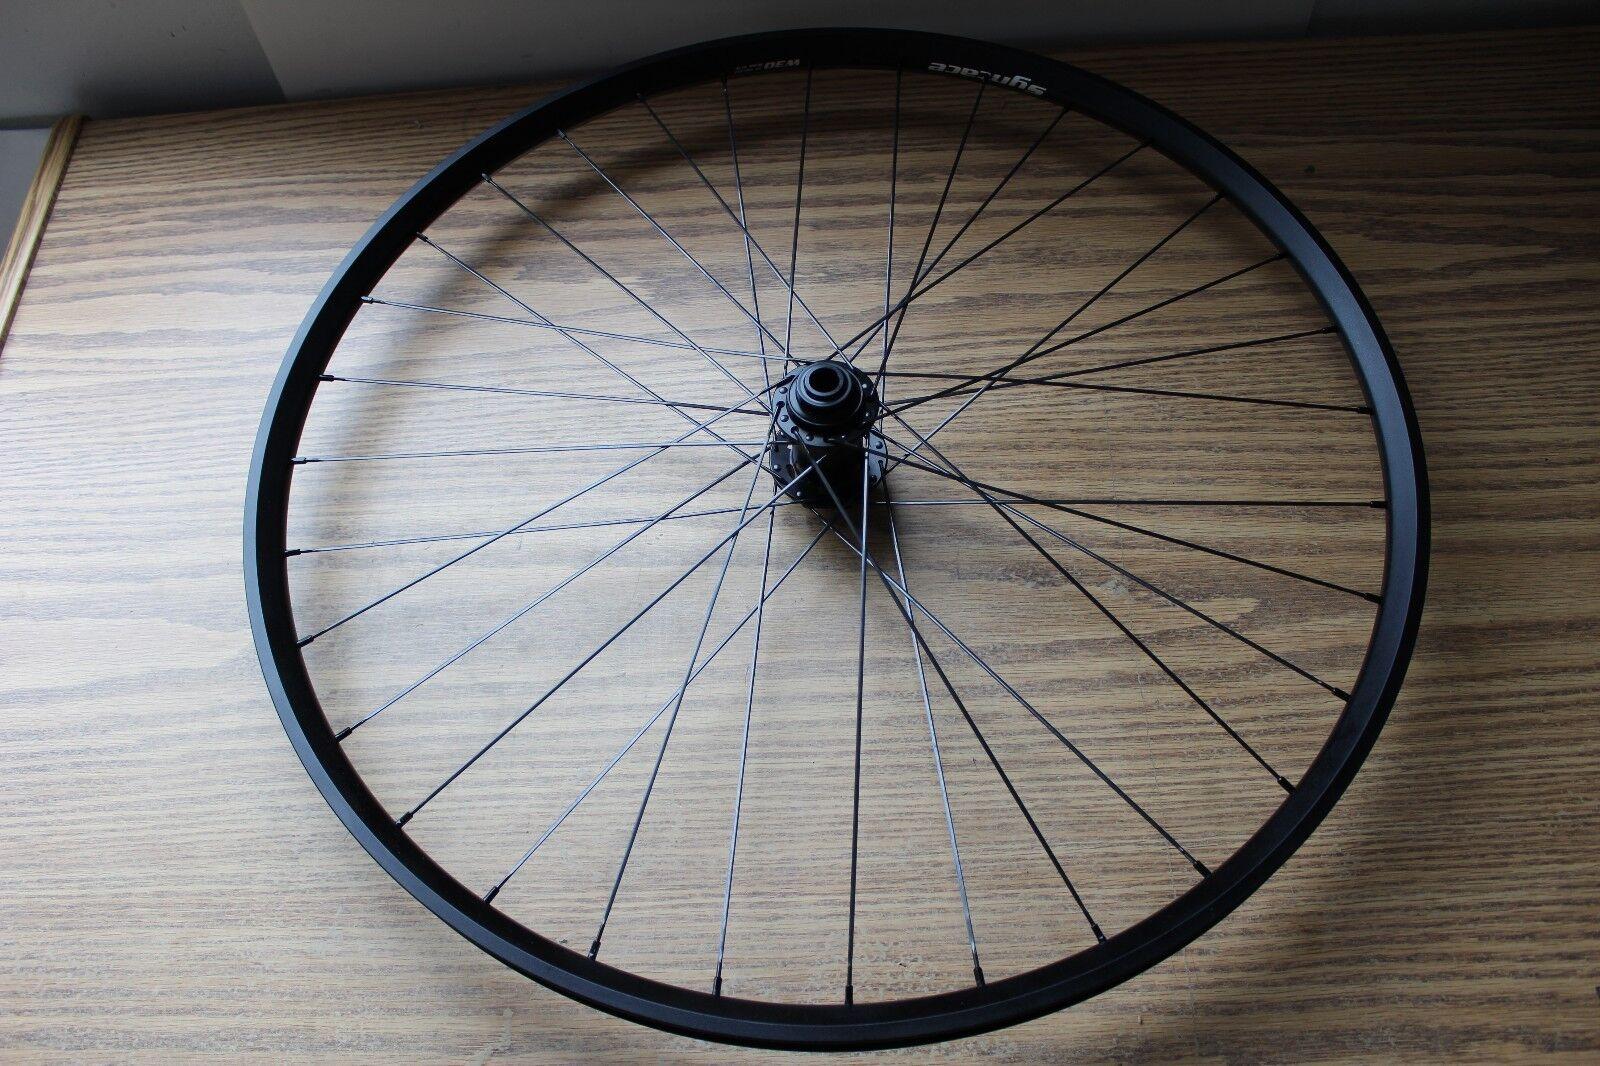 29  MTB Front Bike Wheel Syntace W30 15mm Thru-Axle Disc Brake Lightweight New